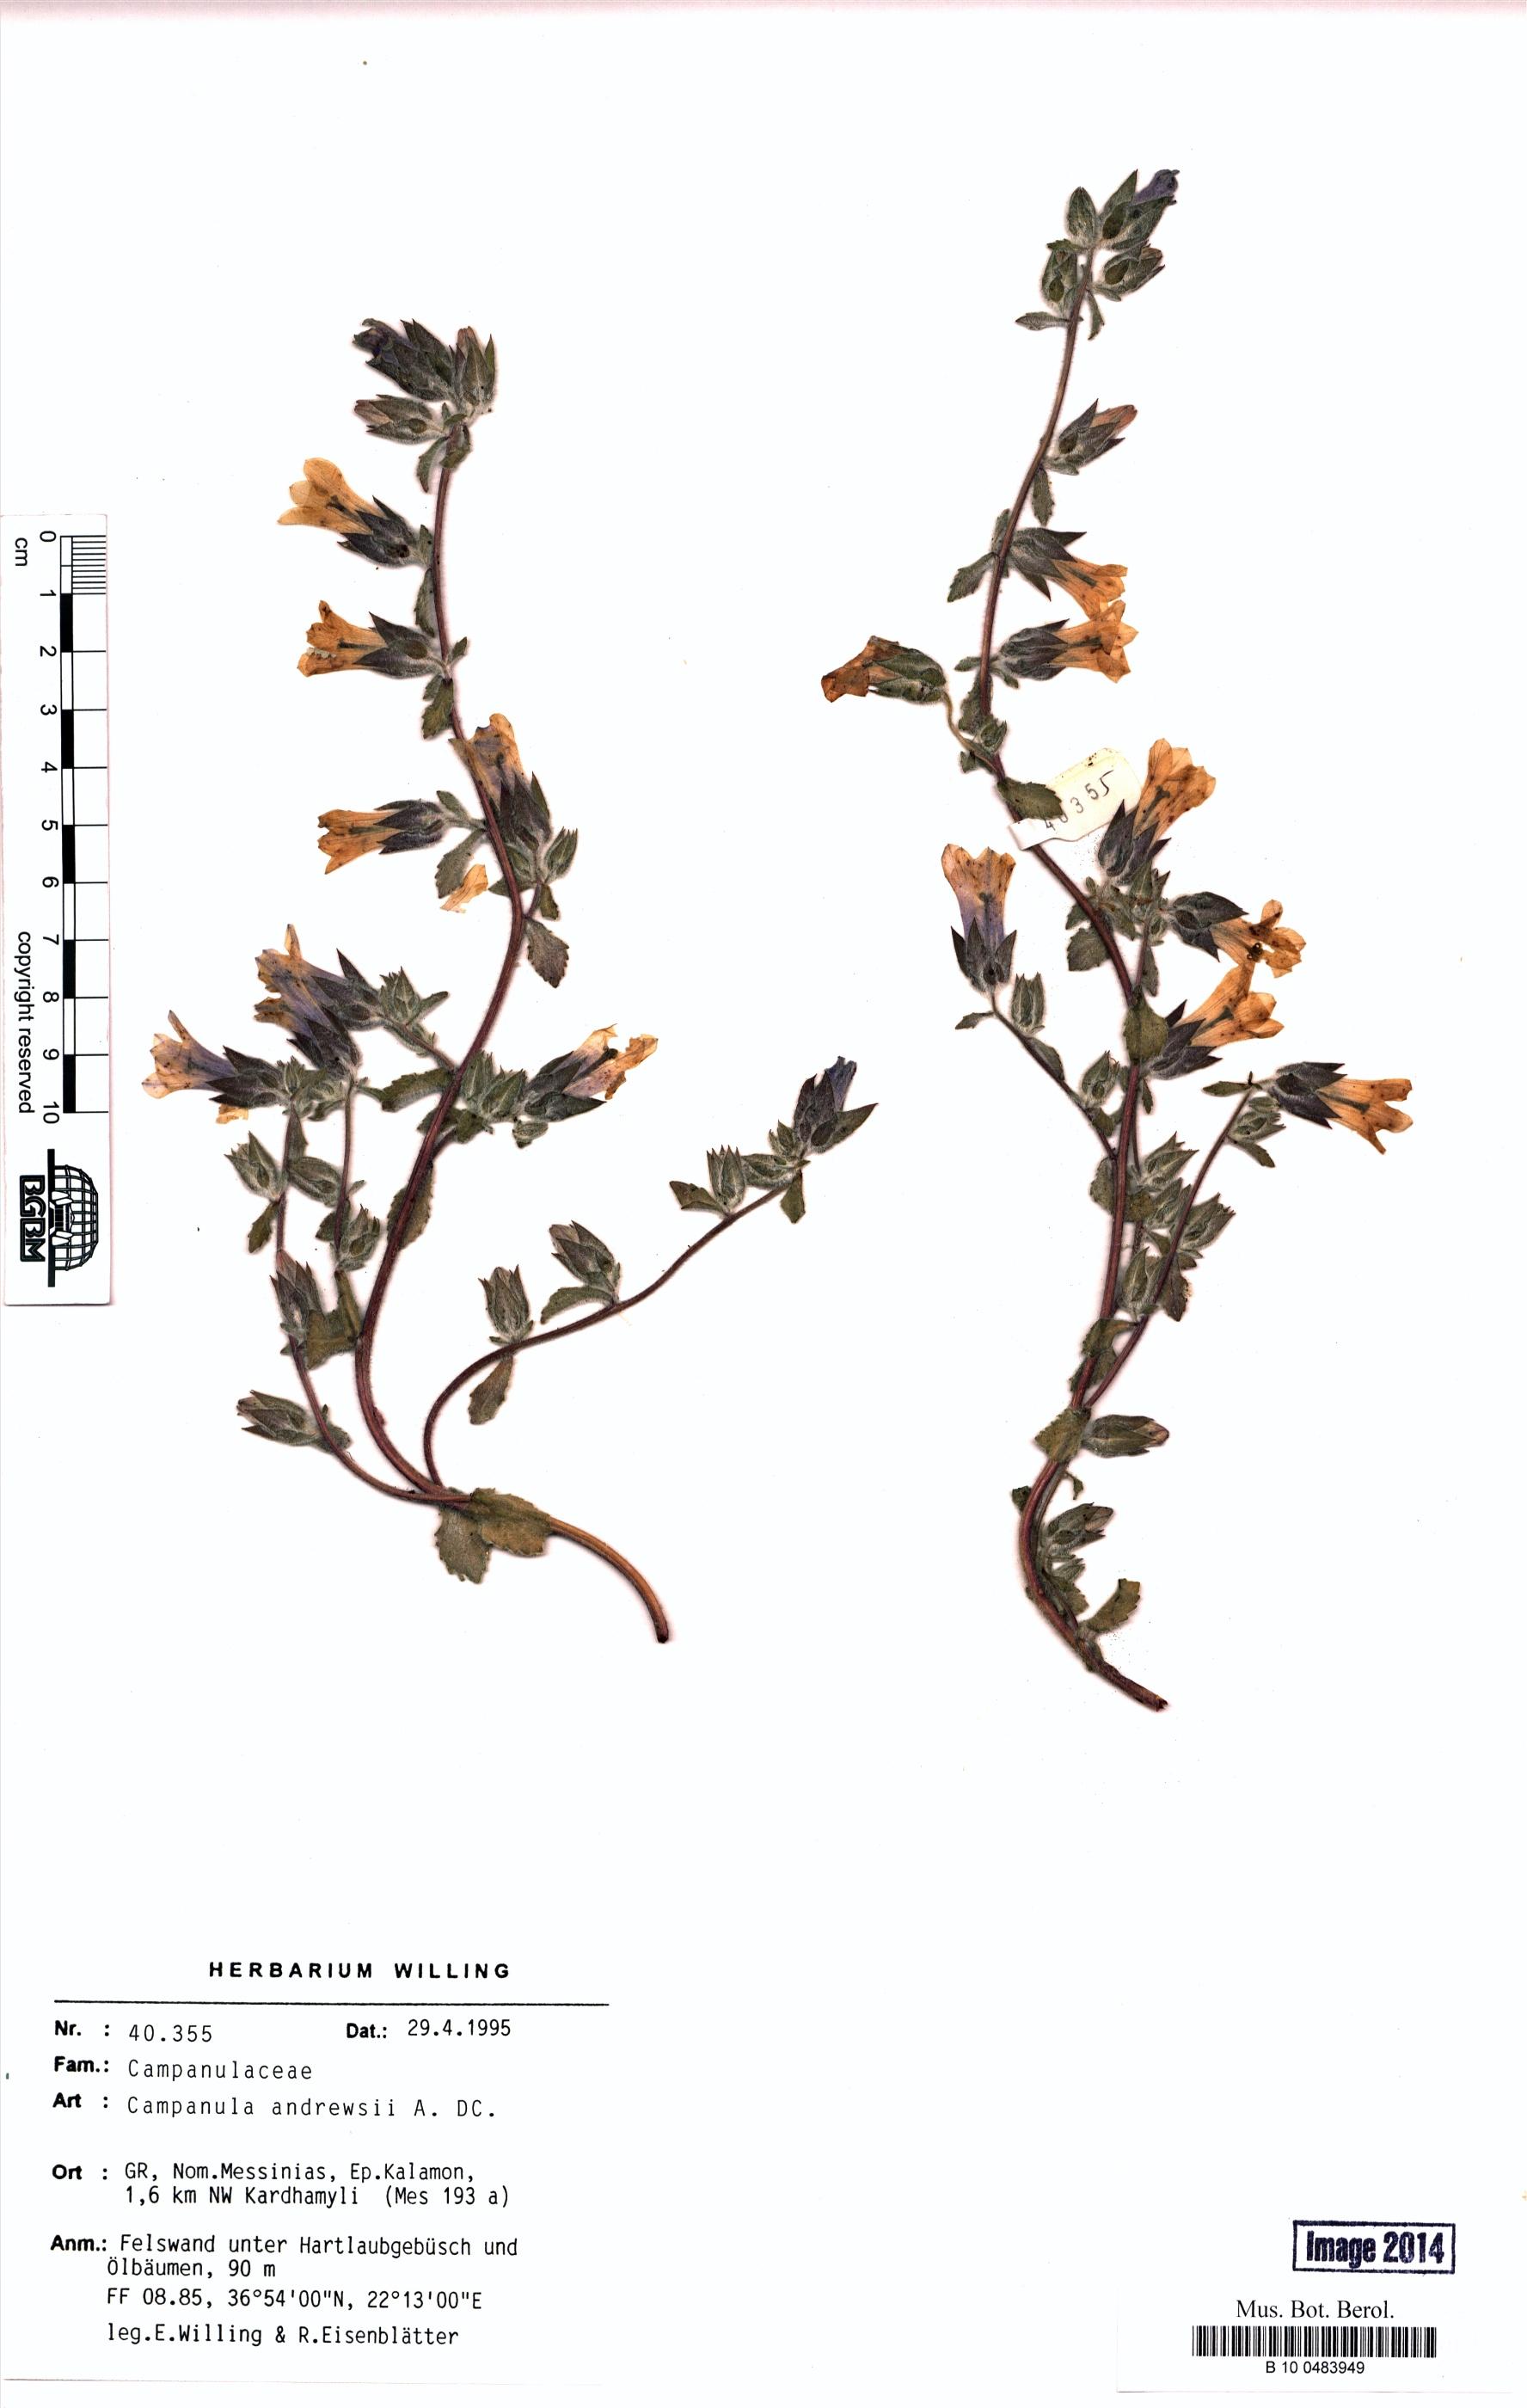 http://ww2.bgbm.org/herbarium/images/B/10/04/83/94/B_10_0483949.jpg